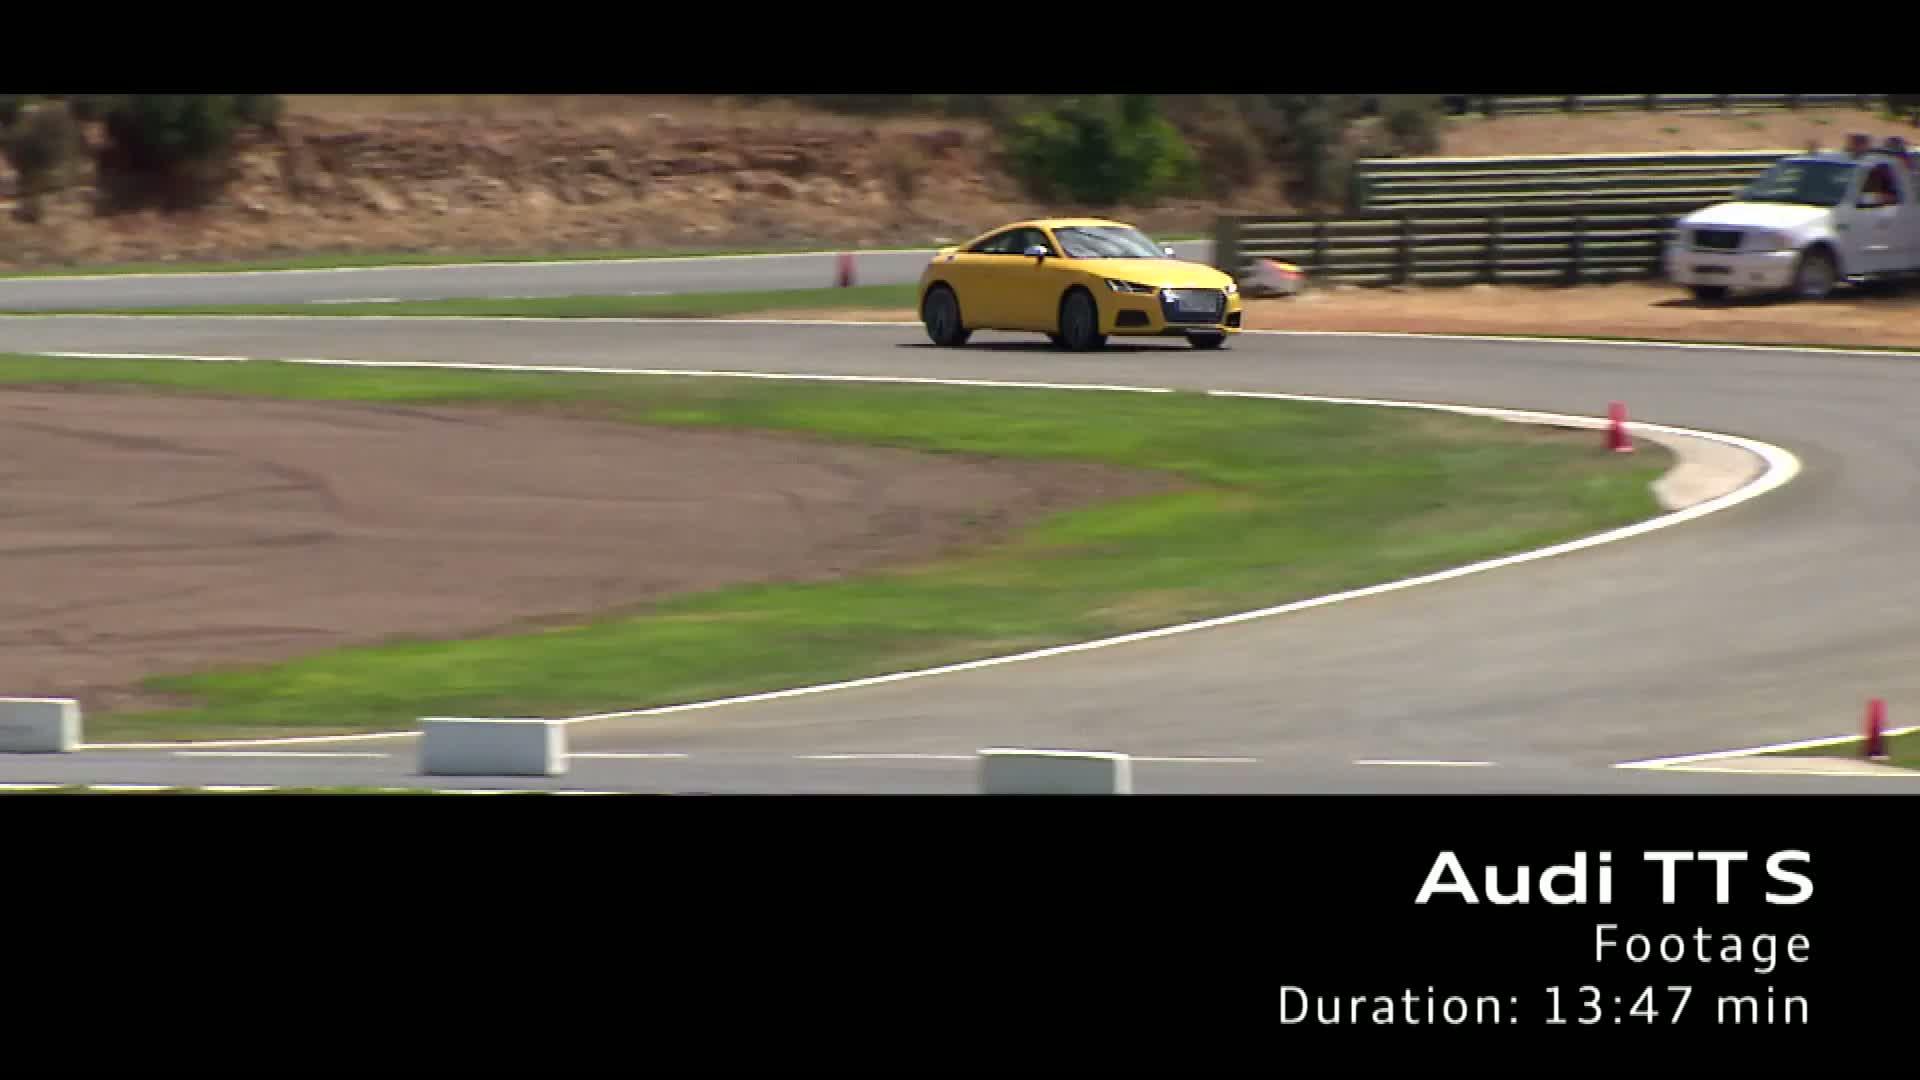 Das Audi TTS Coupé - Footage